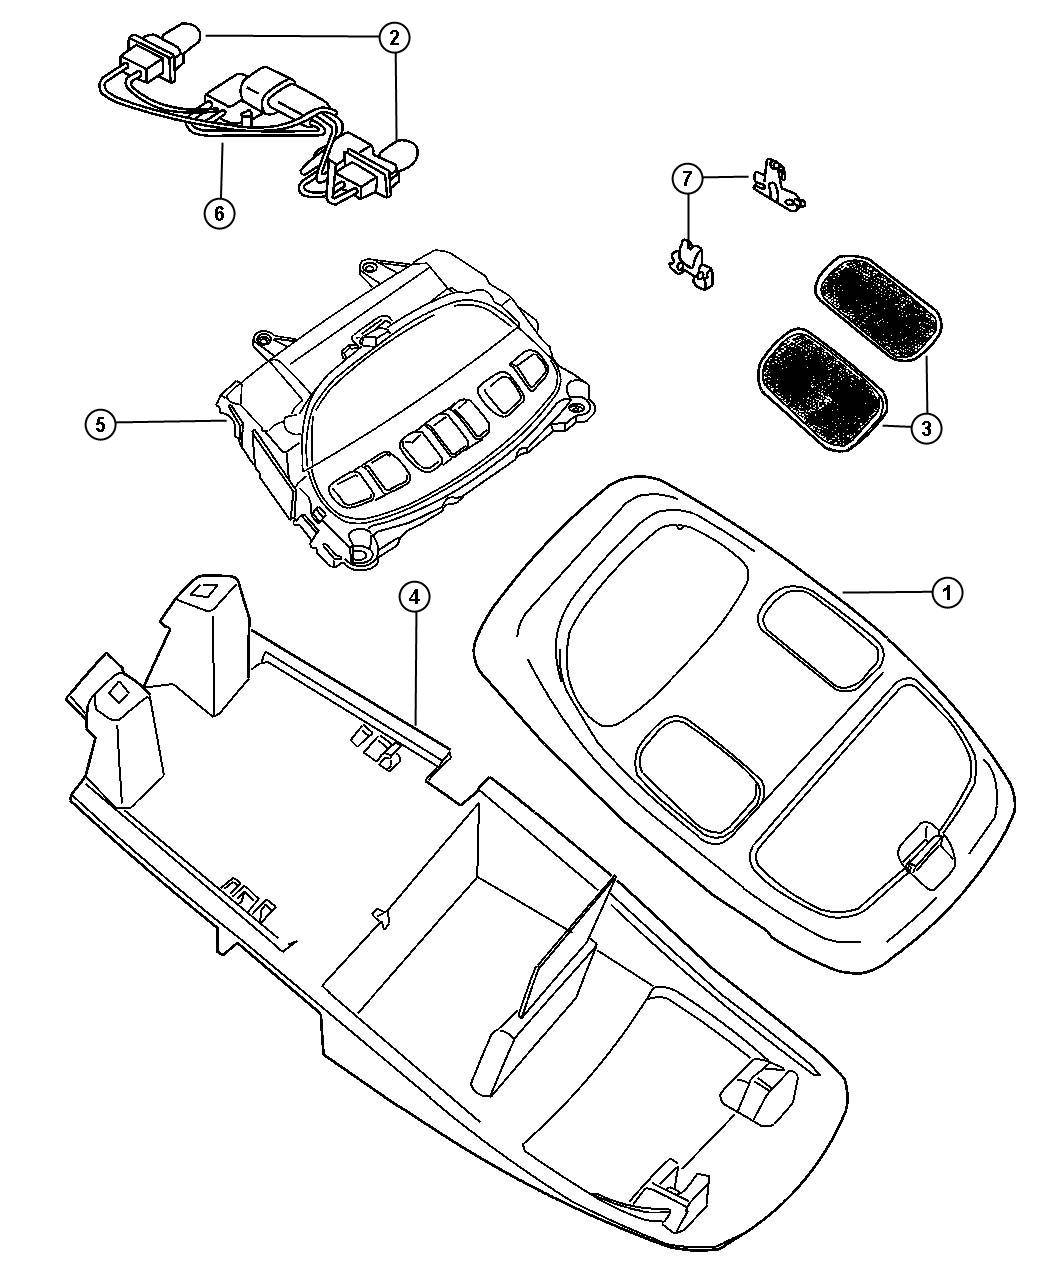 2008 Dodge Ram 5500 Wiring  Overhead Console  Trim   All